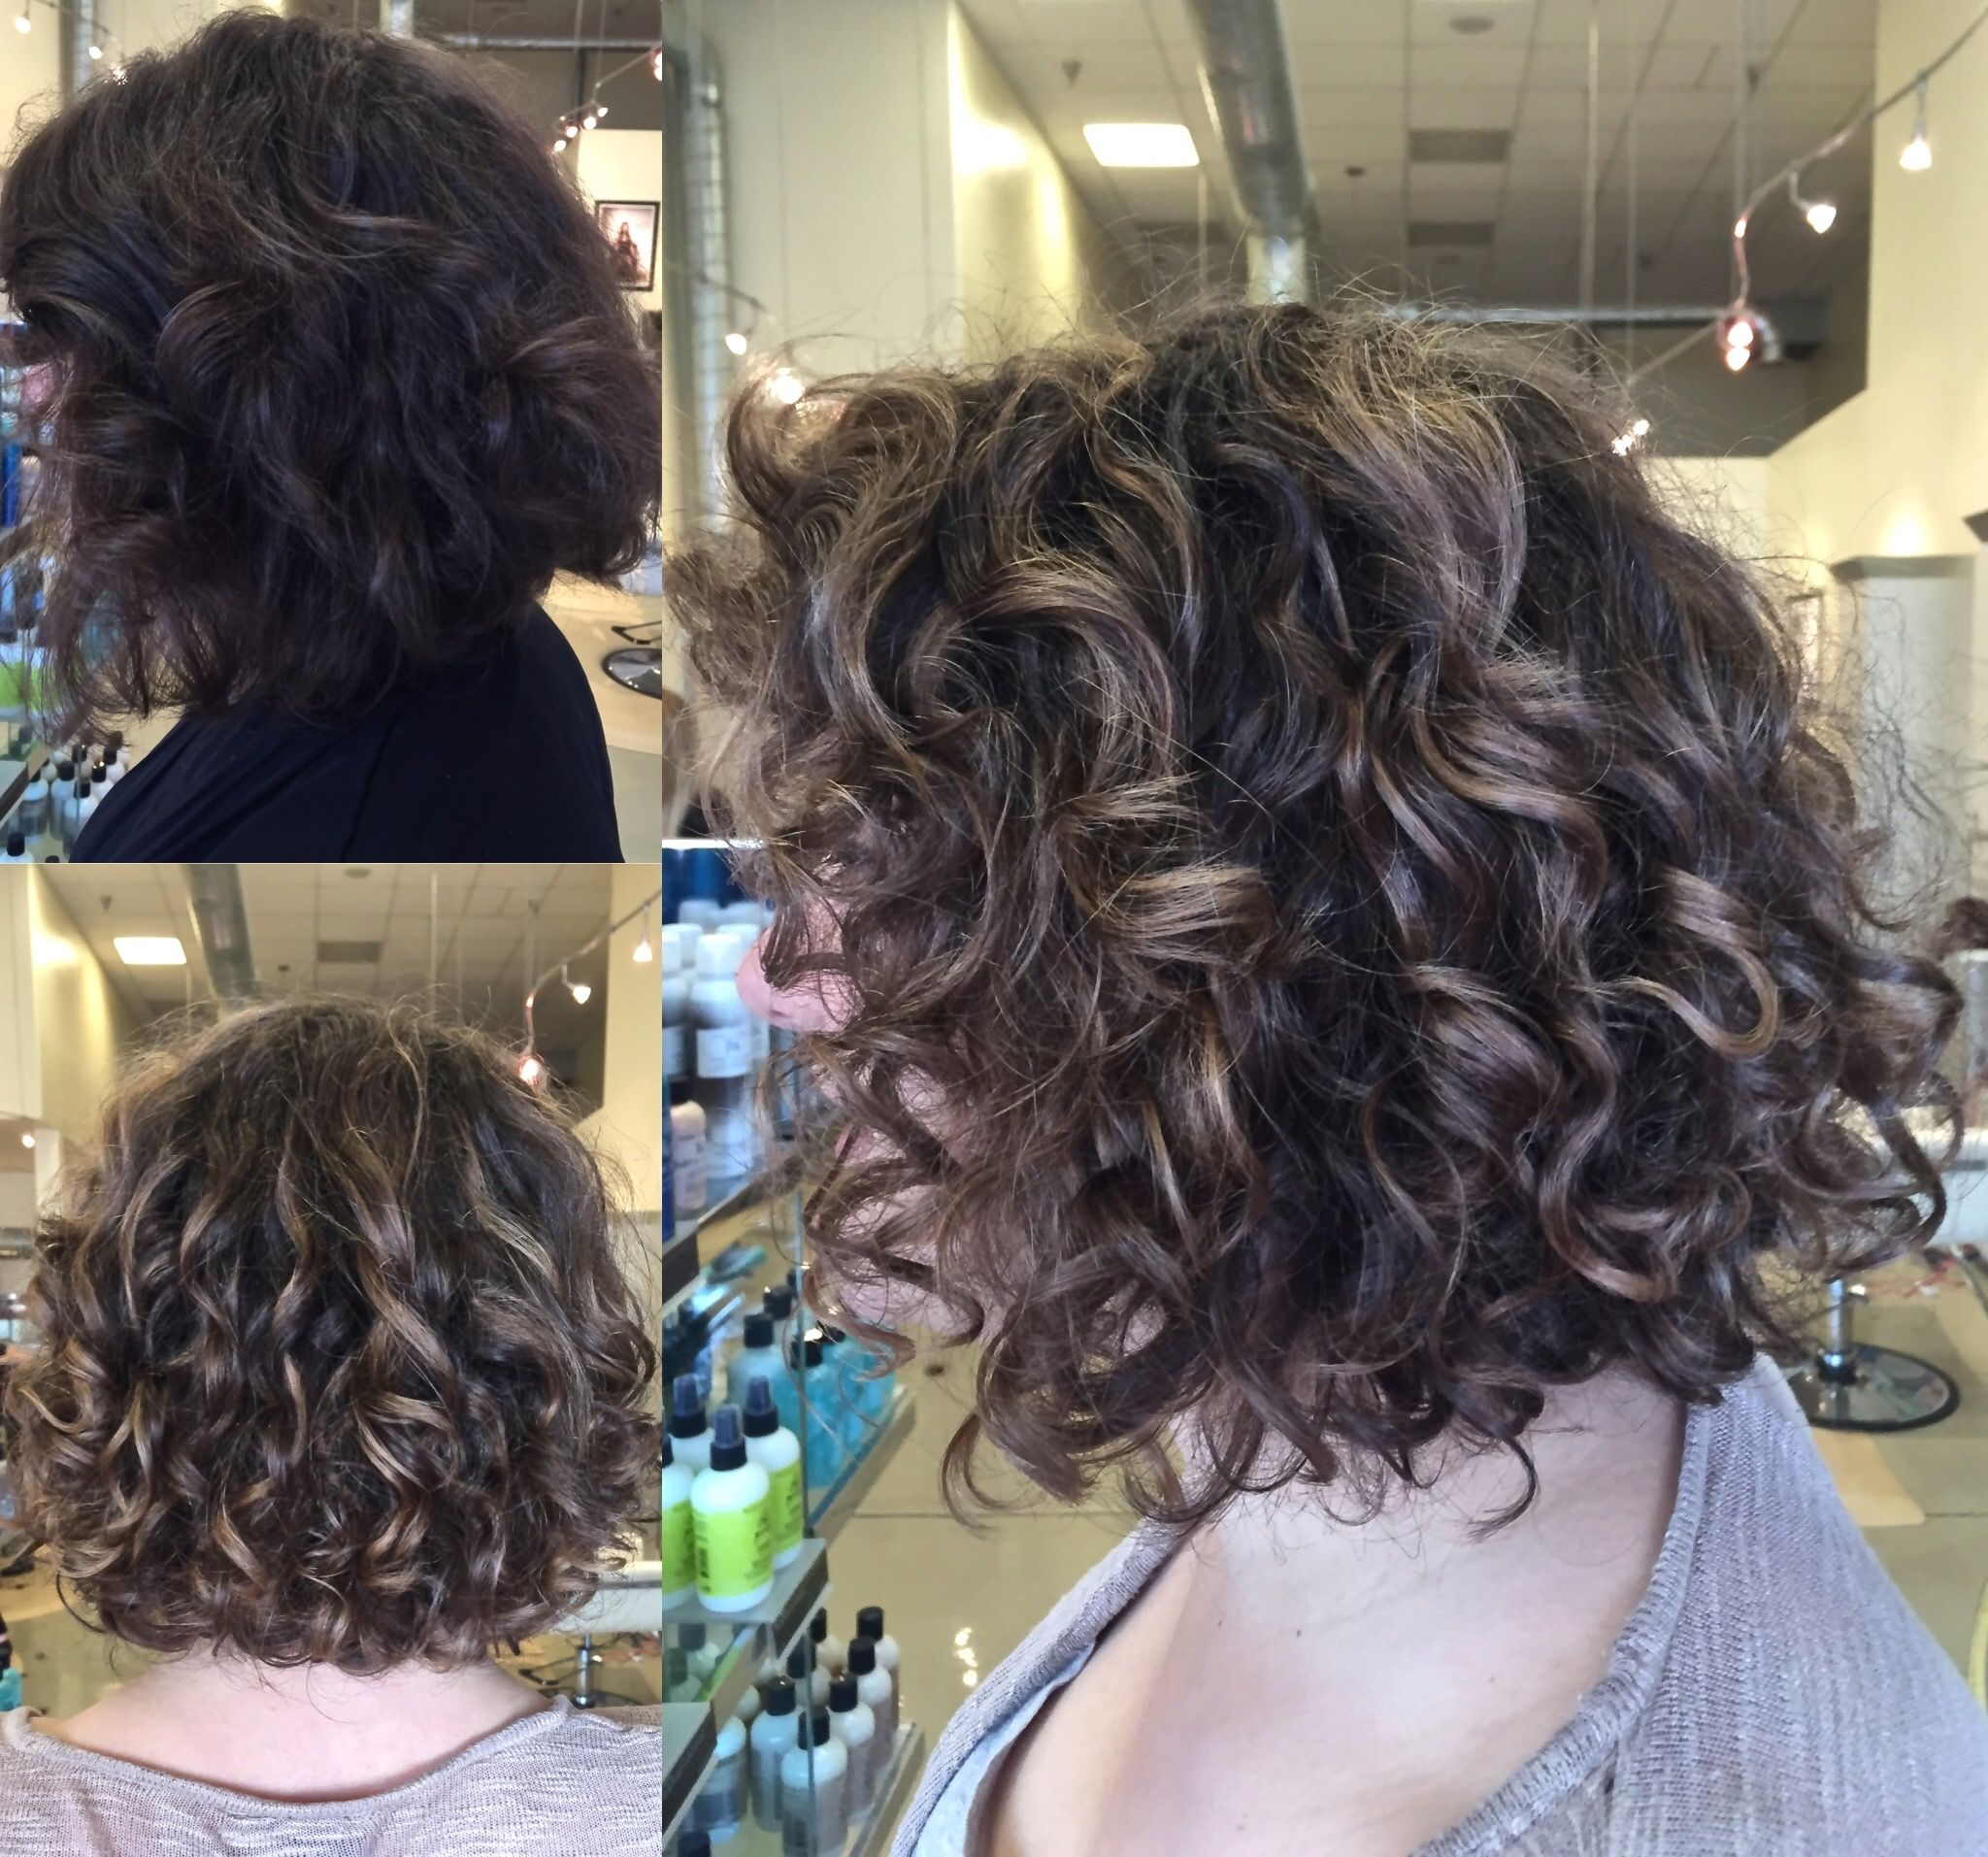 Curly hair balayage highlight on lob short bob Natural curls with